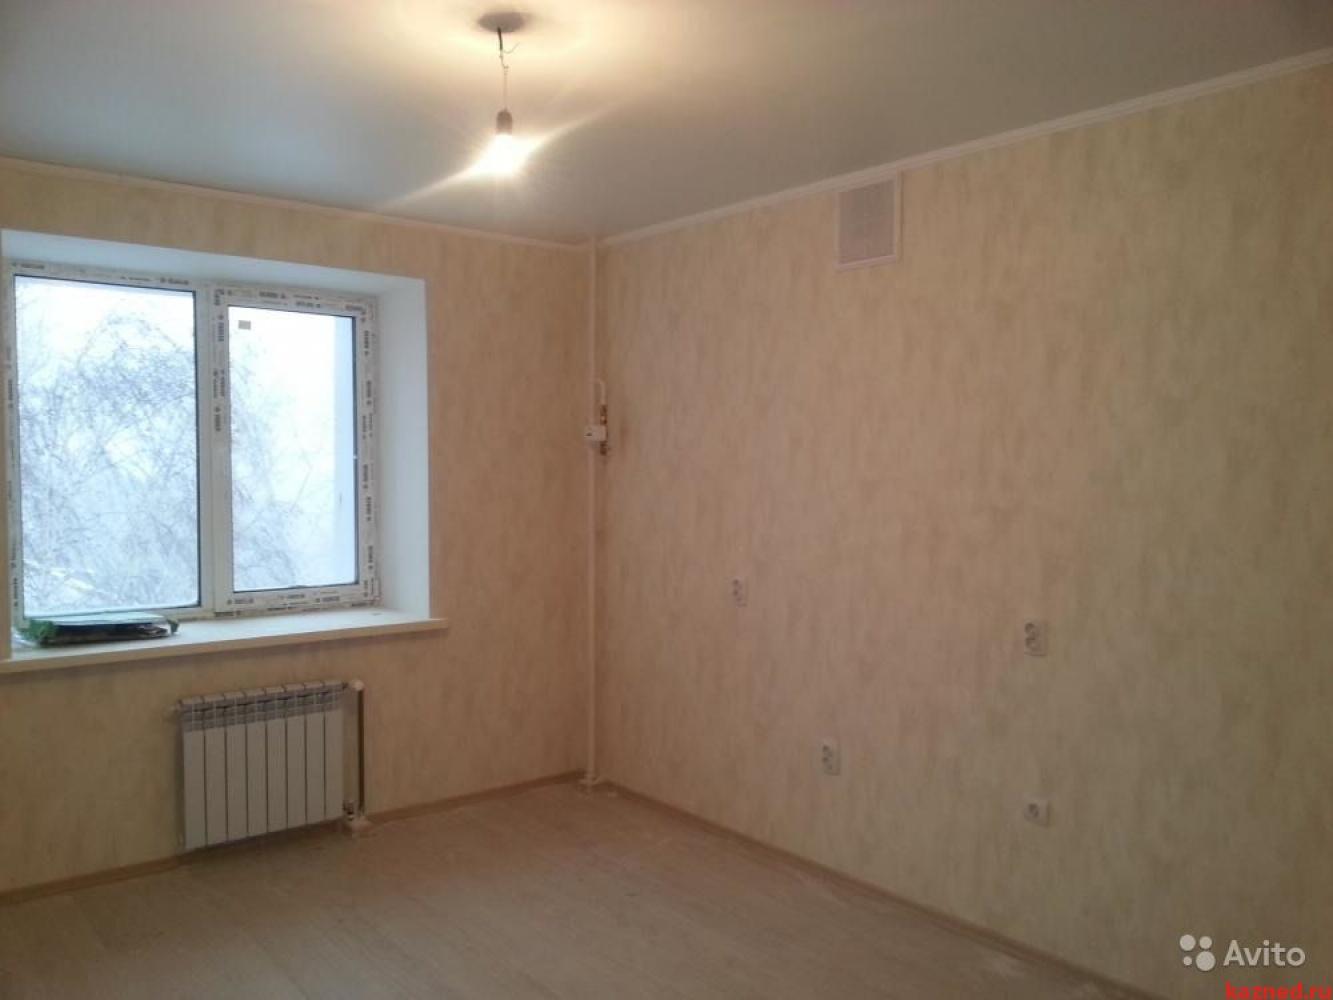 Продам 1-комн.квартиру Даурская, 35А, 49 м2  (миниатюра №2)